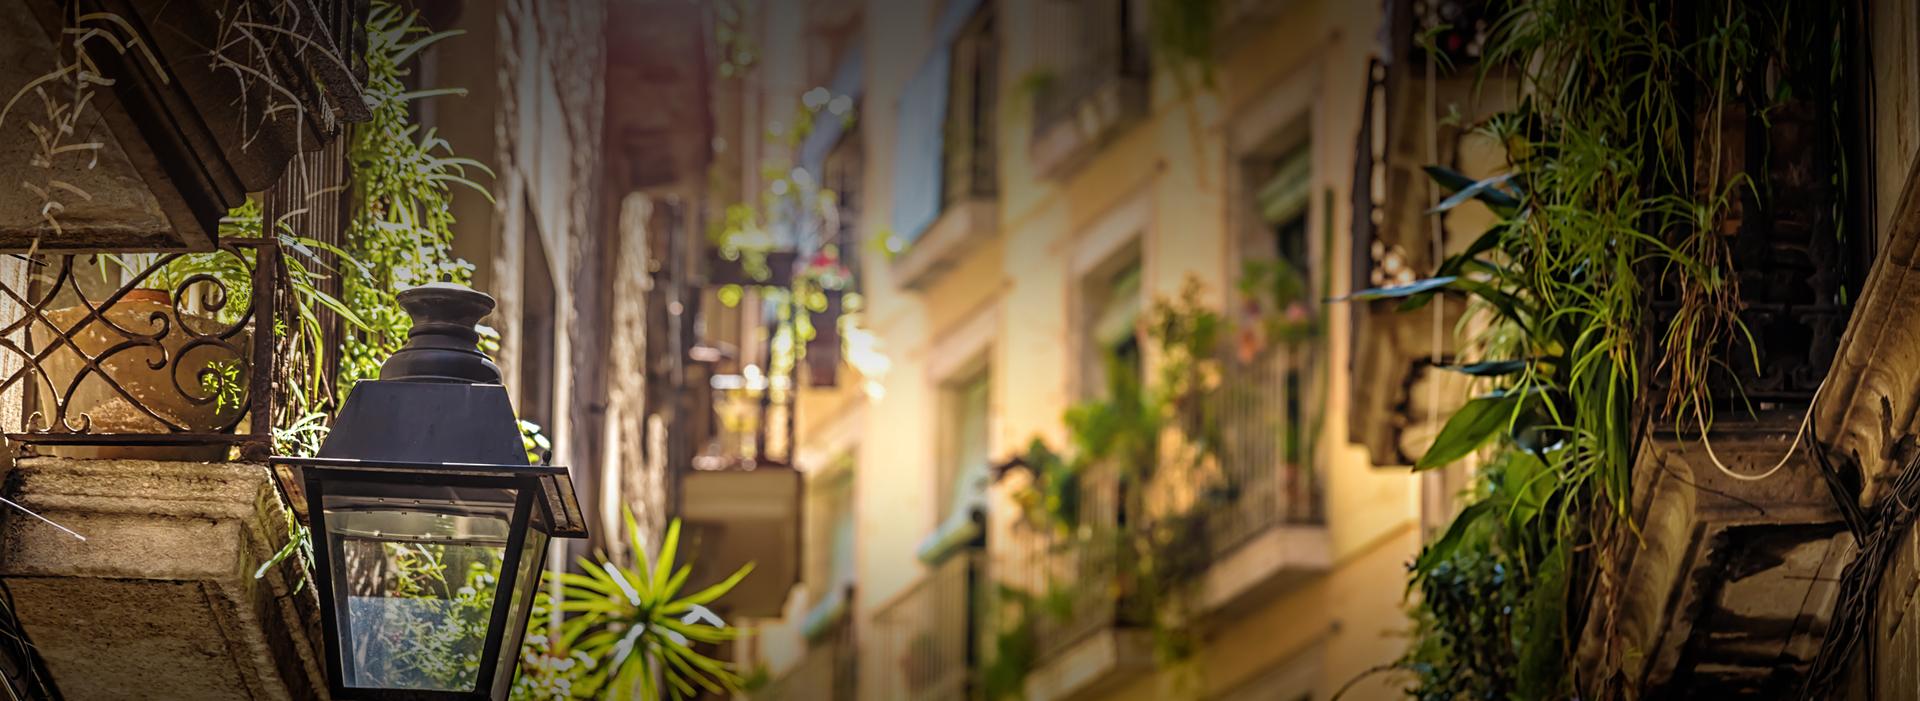 Jaguar Alquiler venta renting coches de lujo en Barcelona